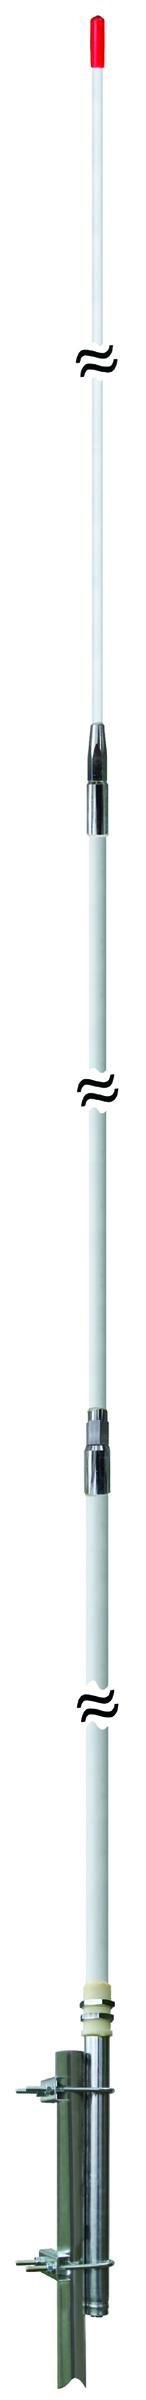 18' 4 SECTION/OMNI-DIRECTIONAL BASE ANT 2000 WATT